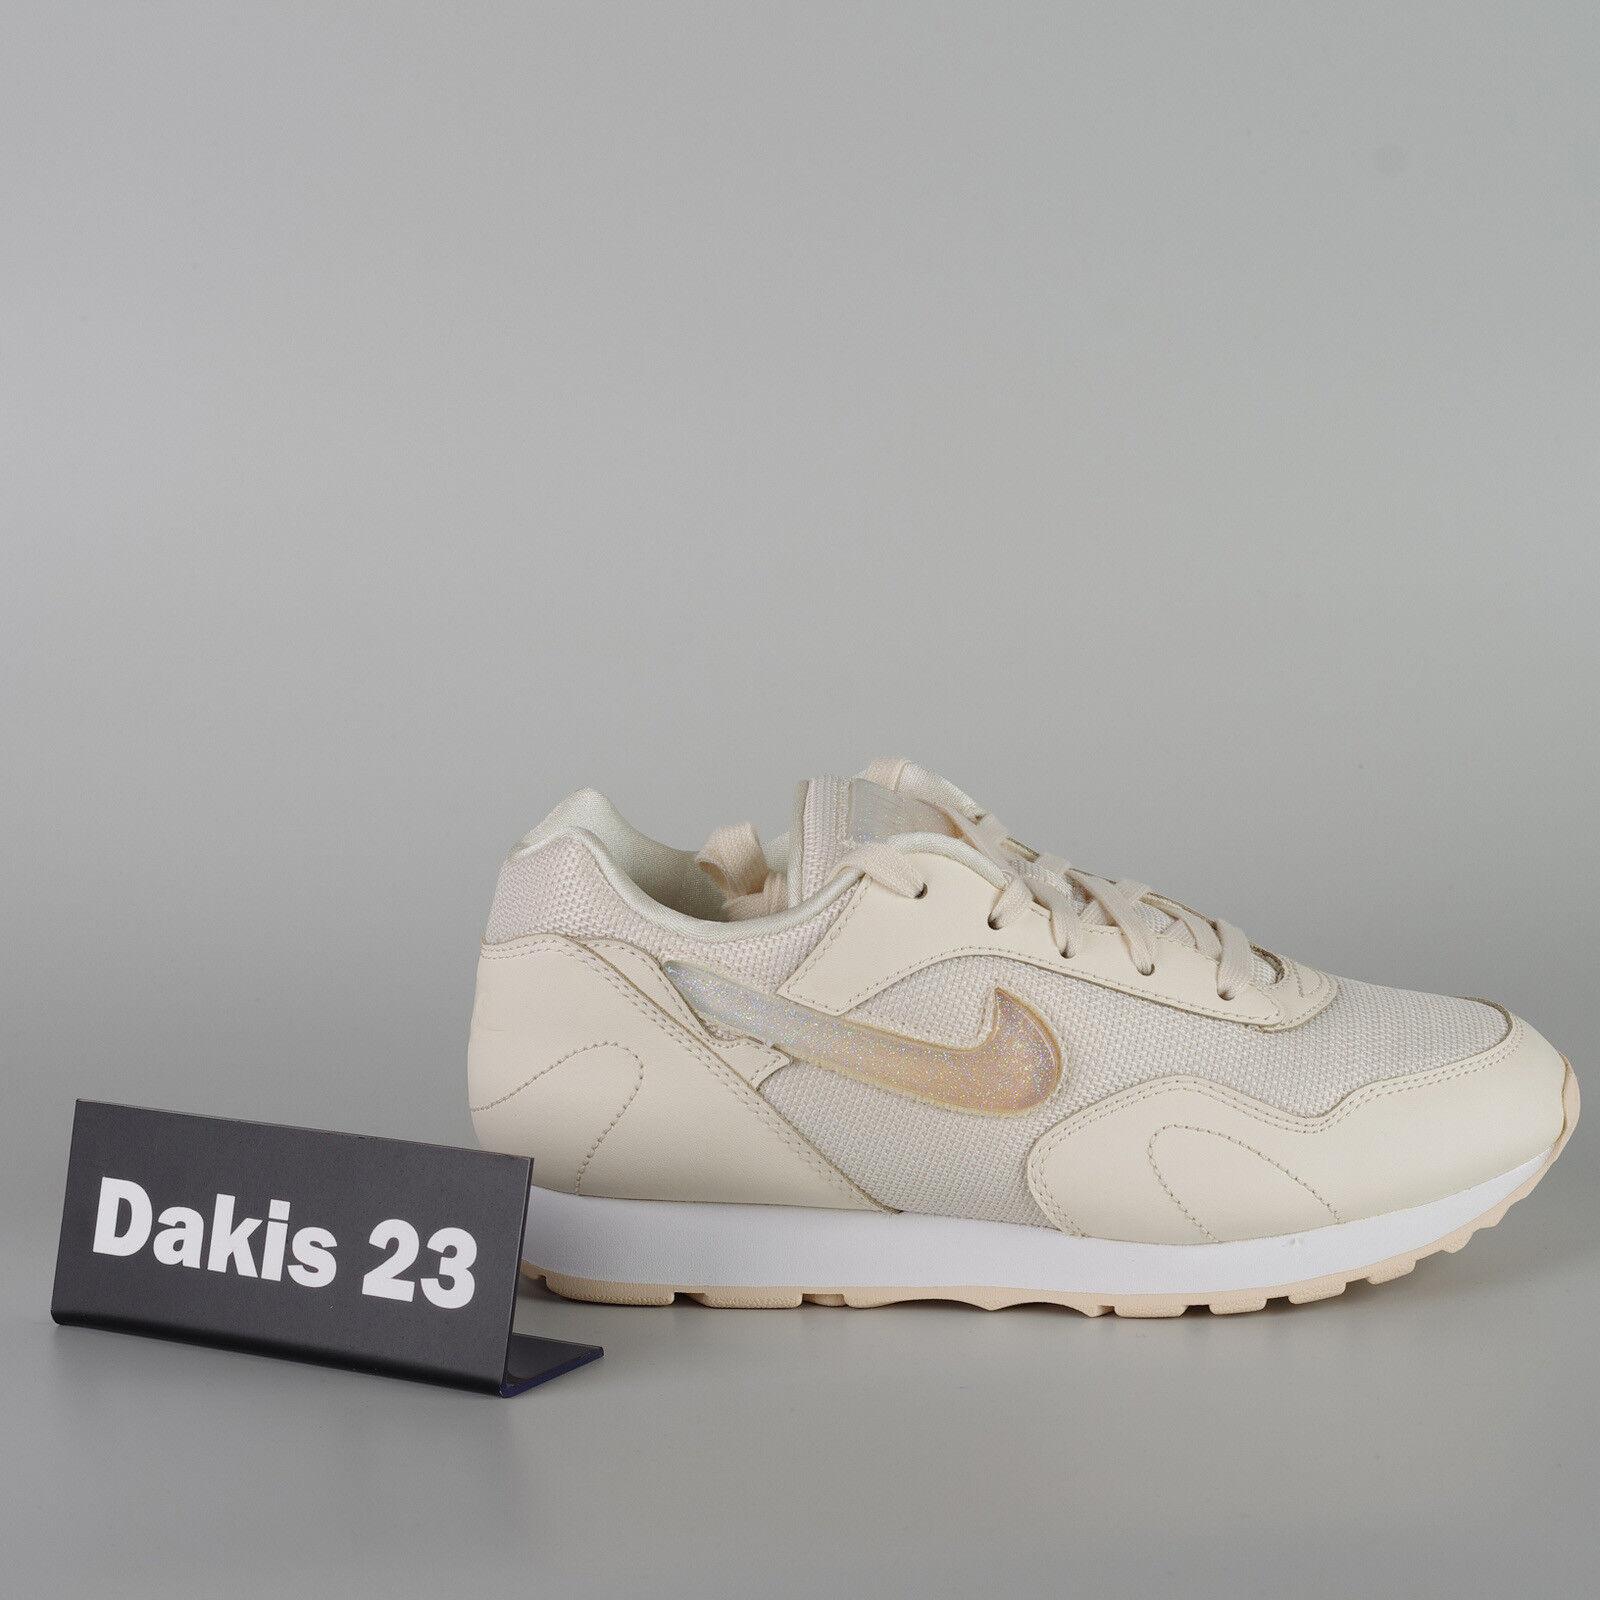 Nike W Outburst PRM donna Jelly Lifestyle scarpe da ginnastica scarpe New Ivory AQ0086-100